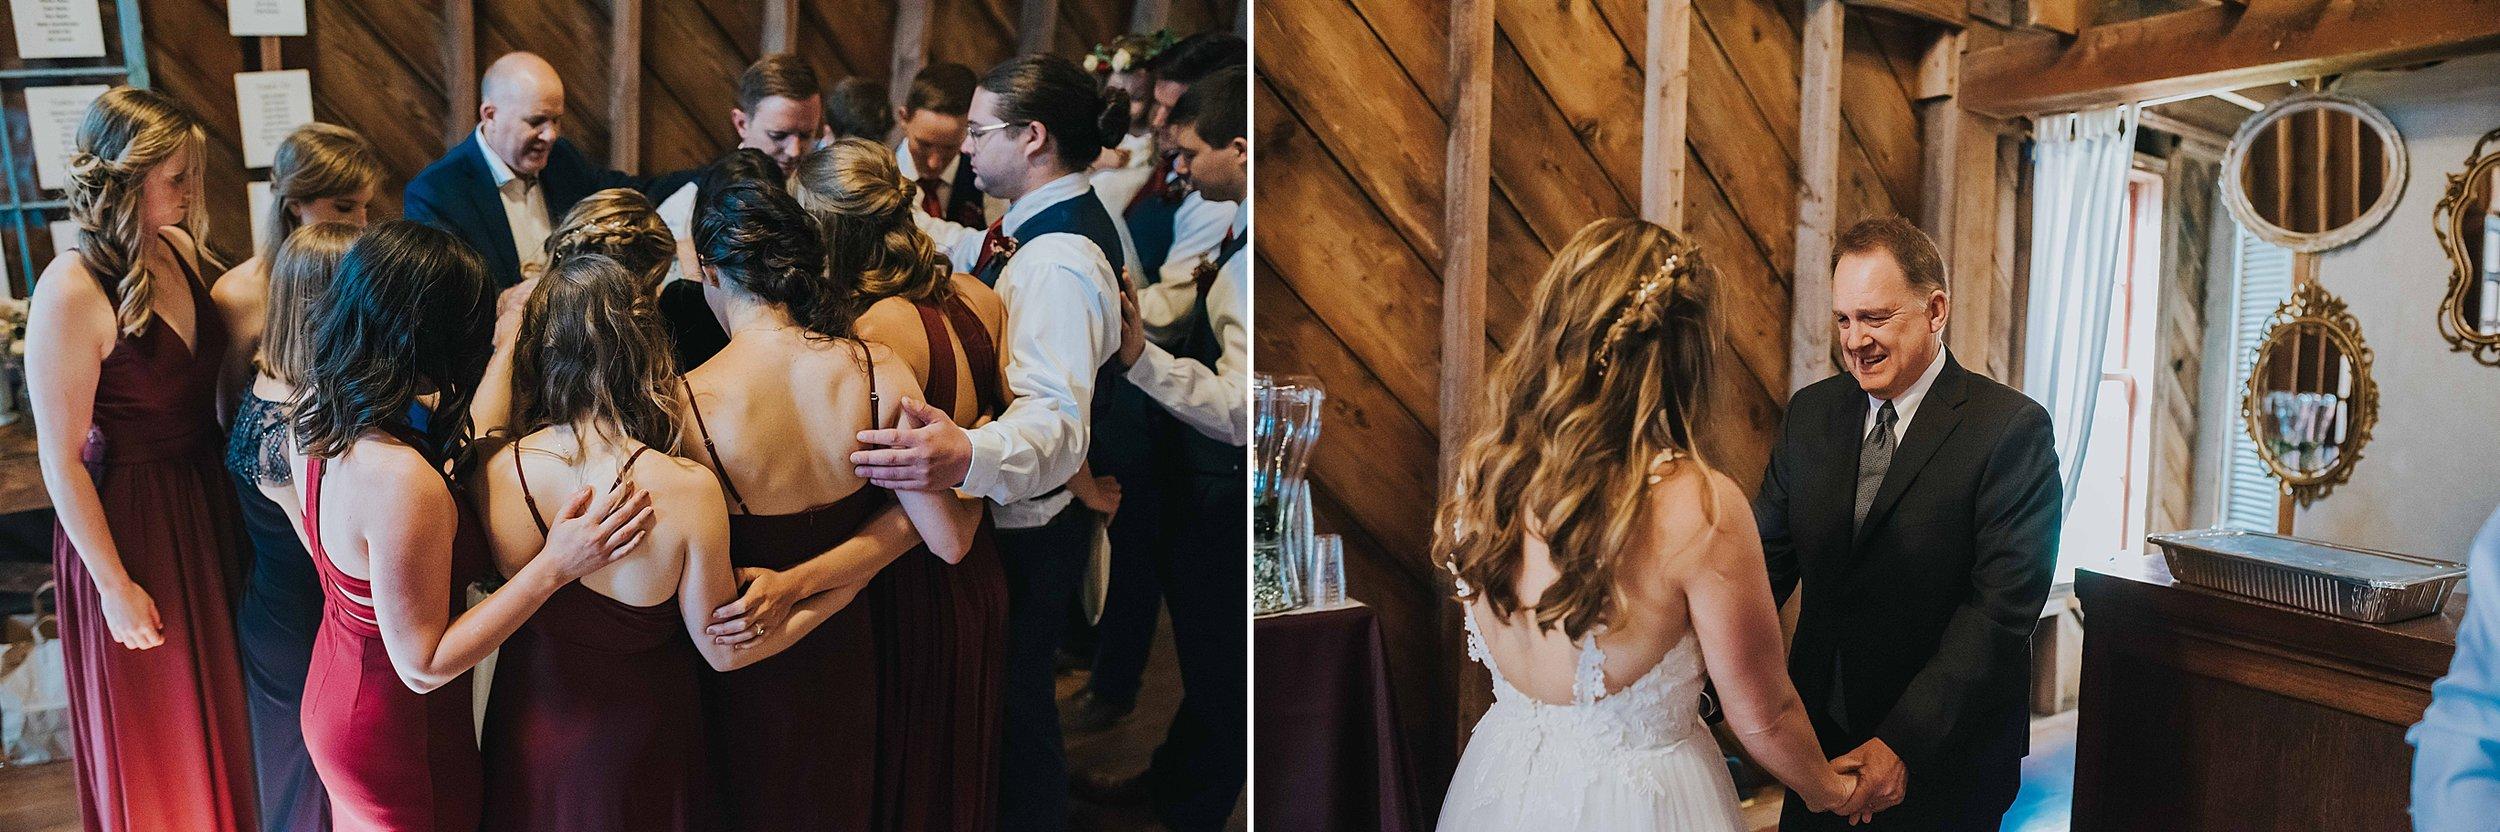 Crockett Farm-Wedding-photographer-J HODGES PHOTOGRAPHY_0293.jpg